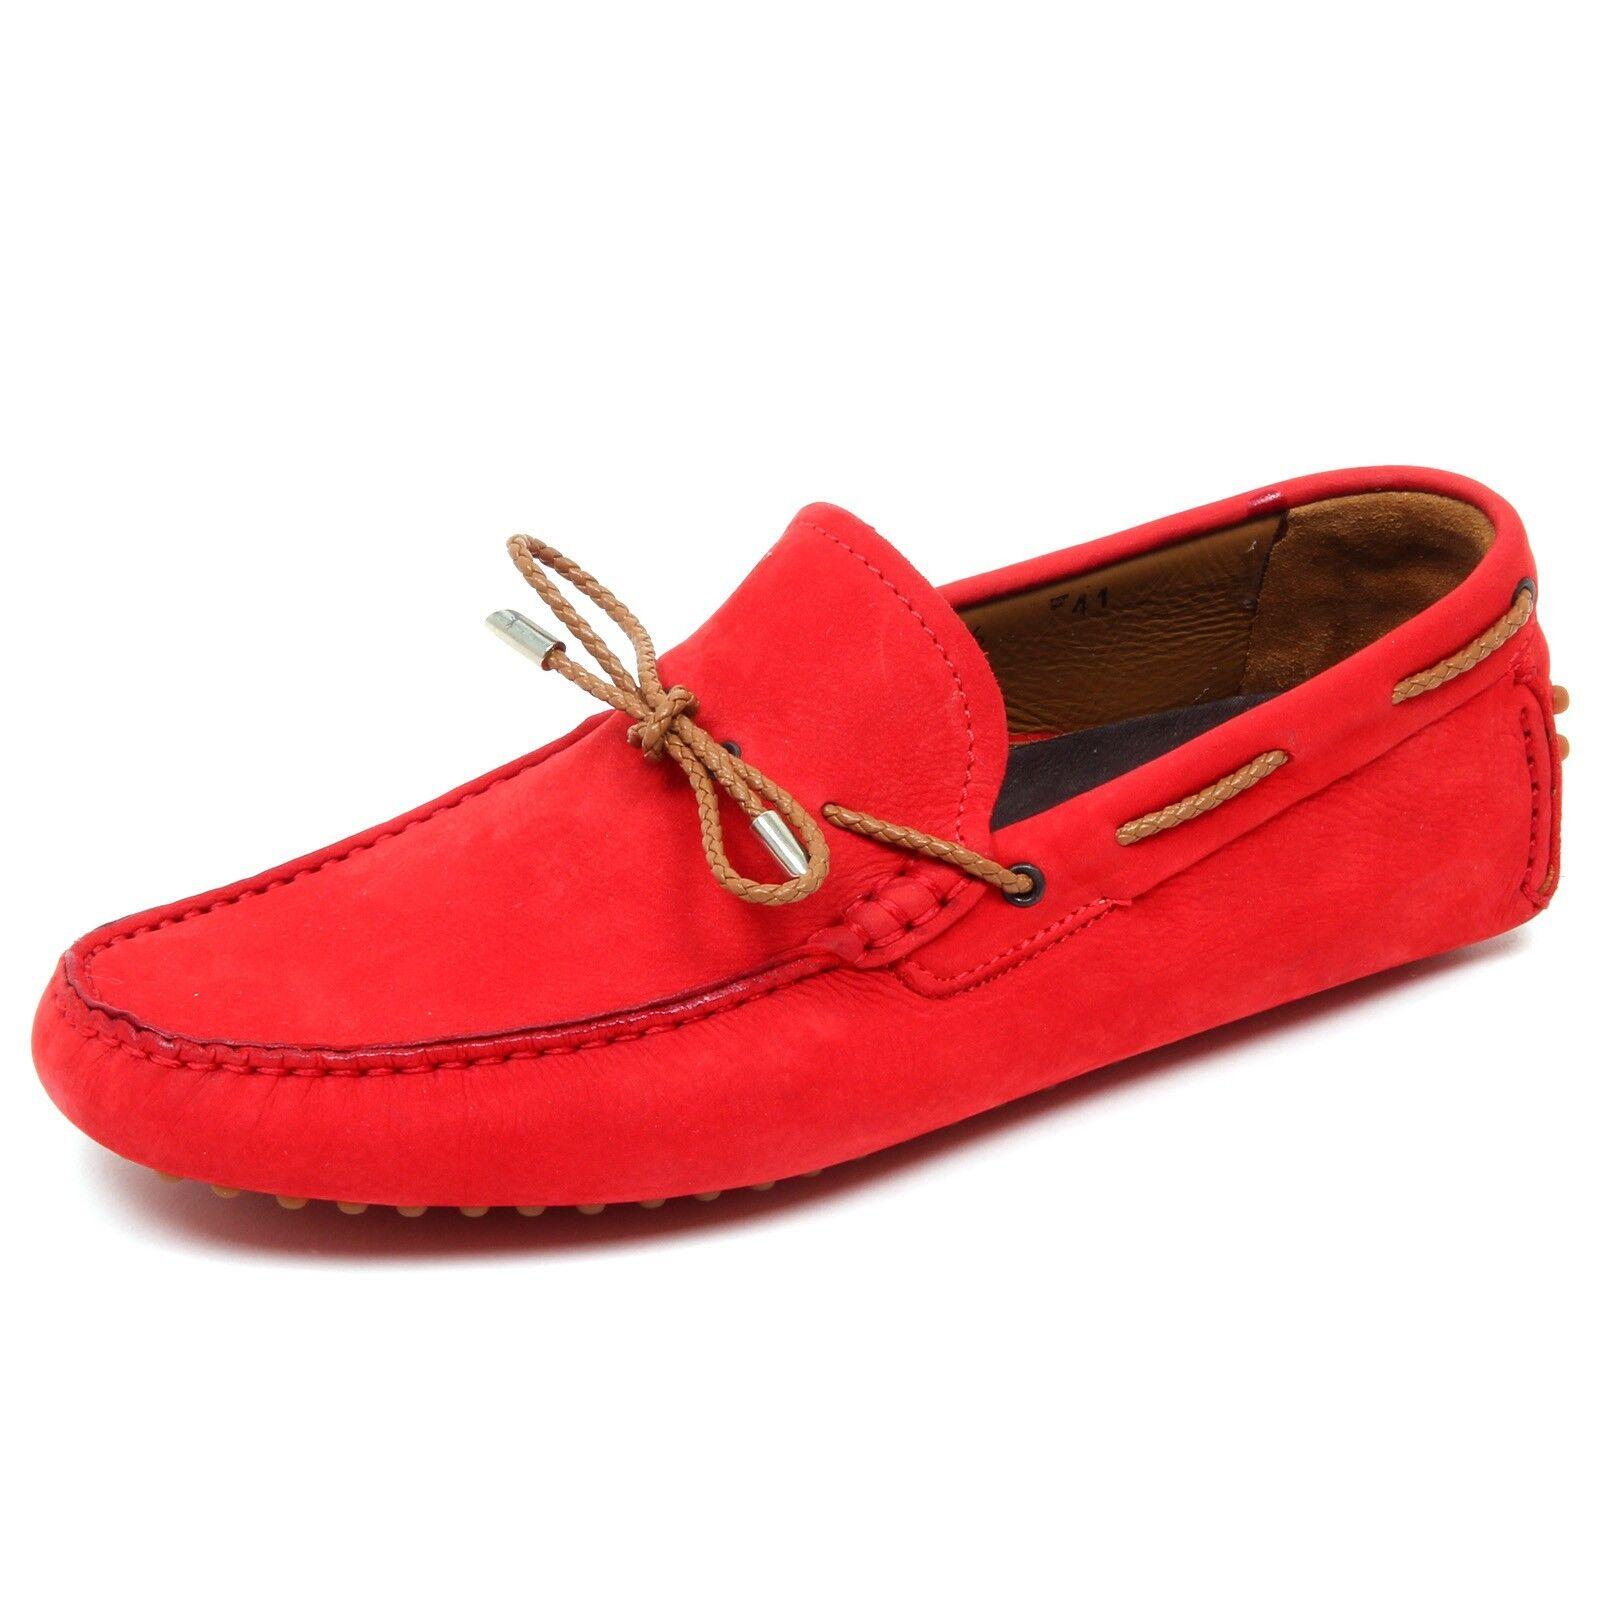 D4400 mocassino uomo CALZOLERIA LA PARIGINA rosso vintage loafer shoe man